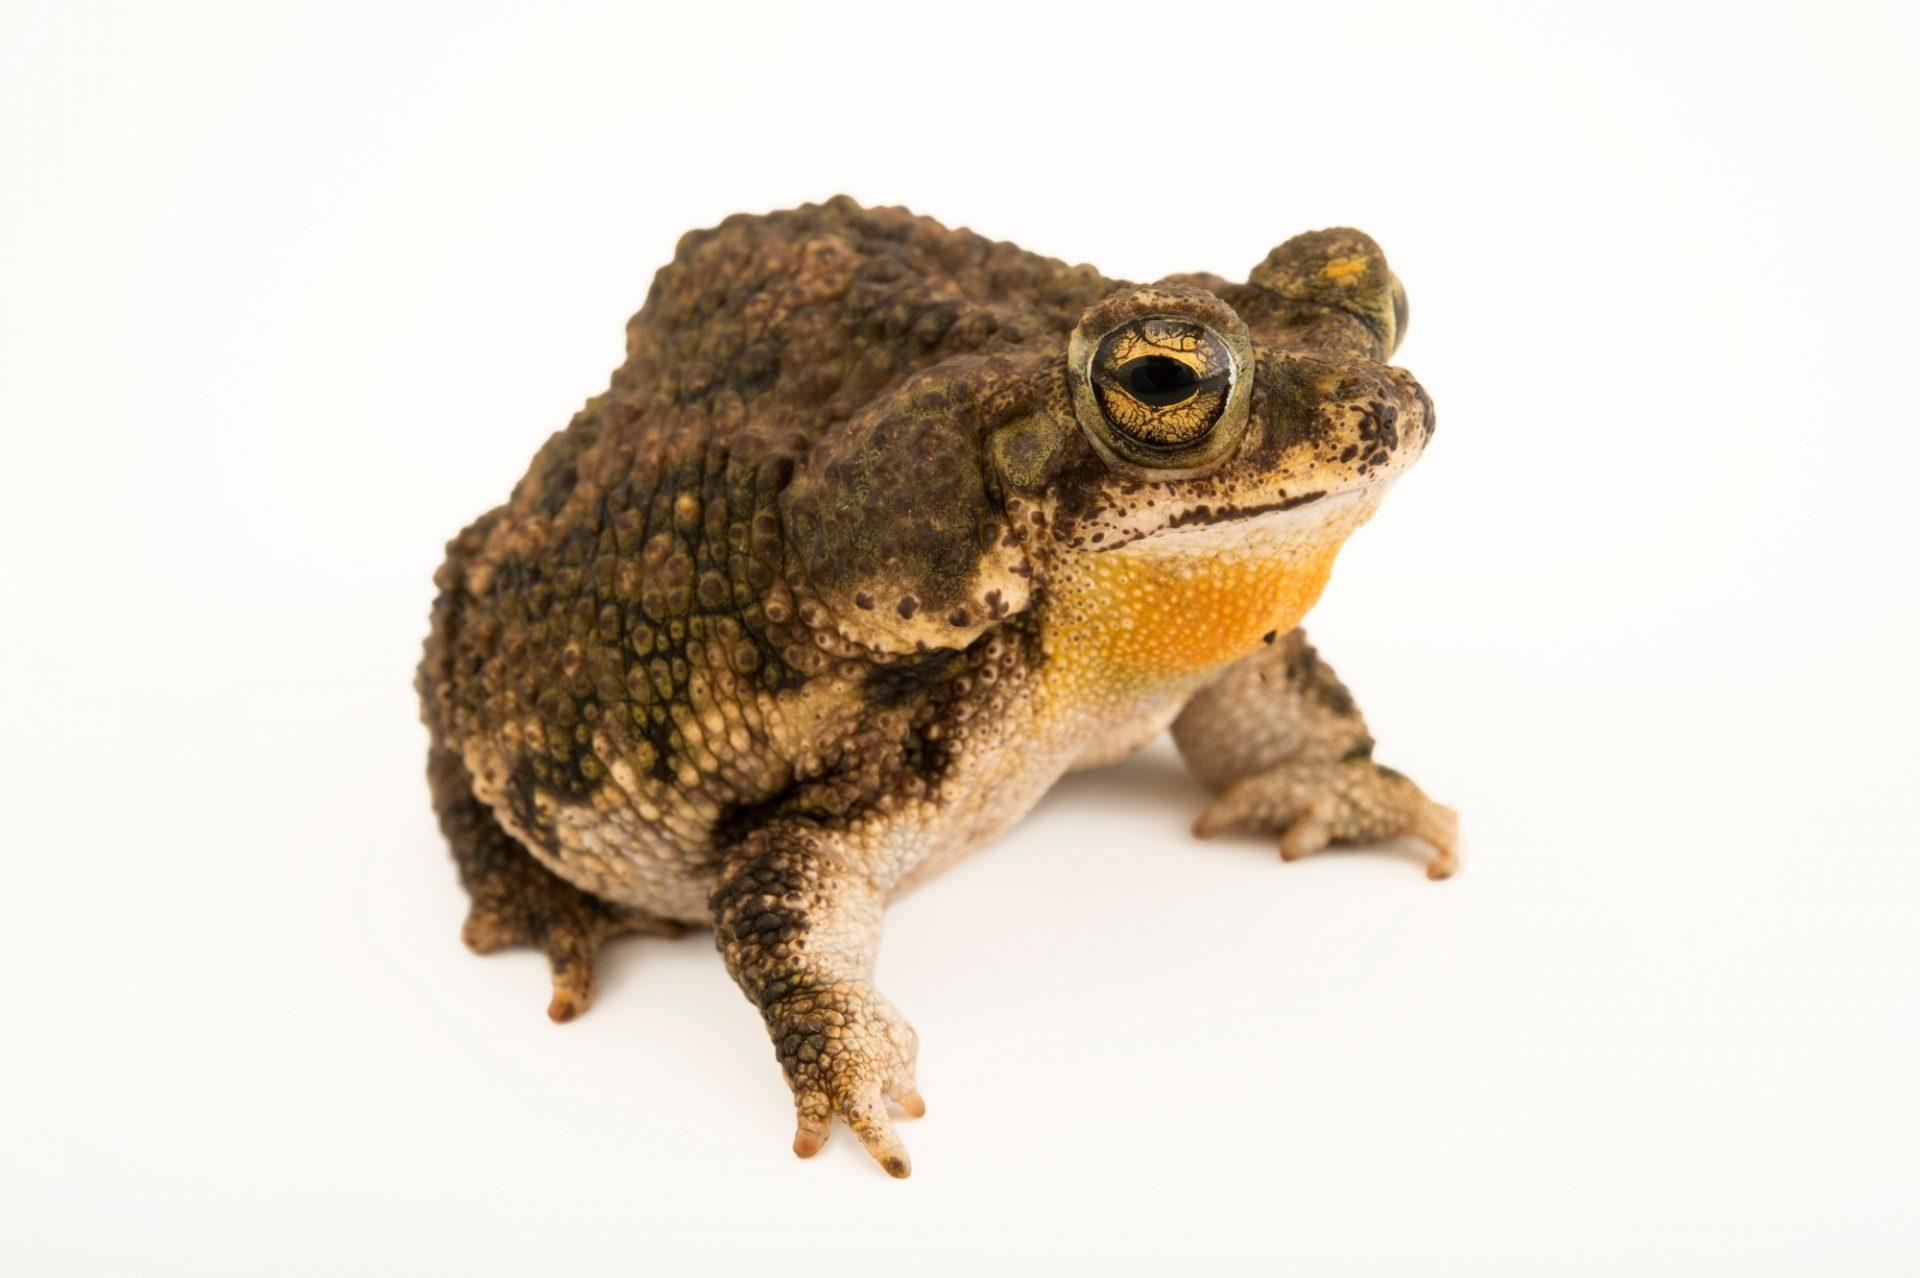 Photo: Granular toad (Rhinella granulosa) at the El Valle Amphibian Conservation Center (EVACC).